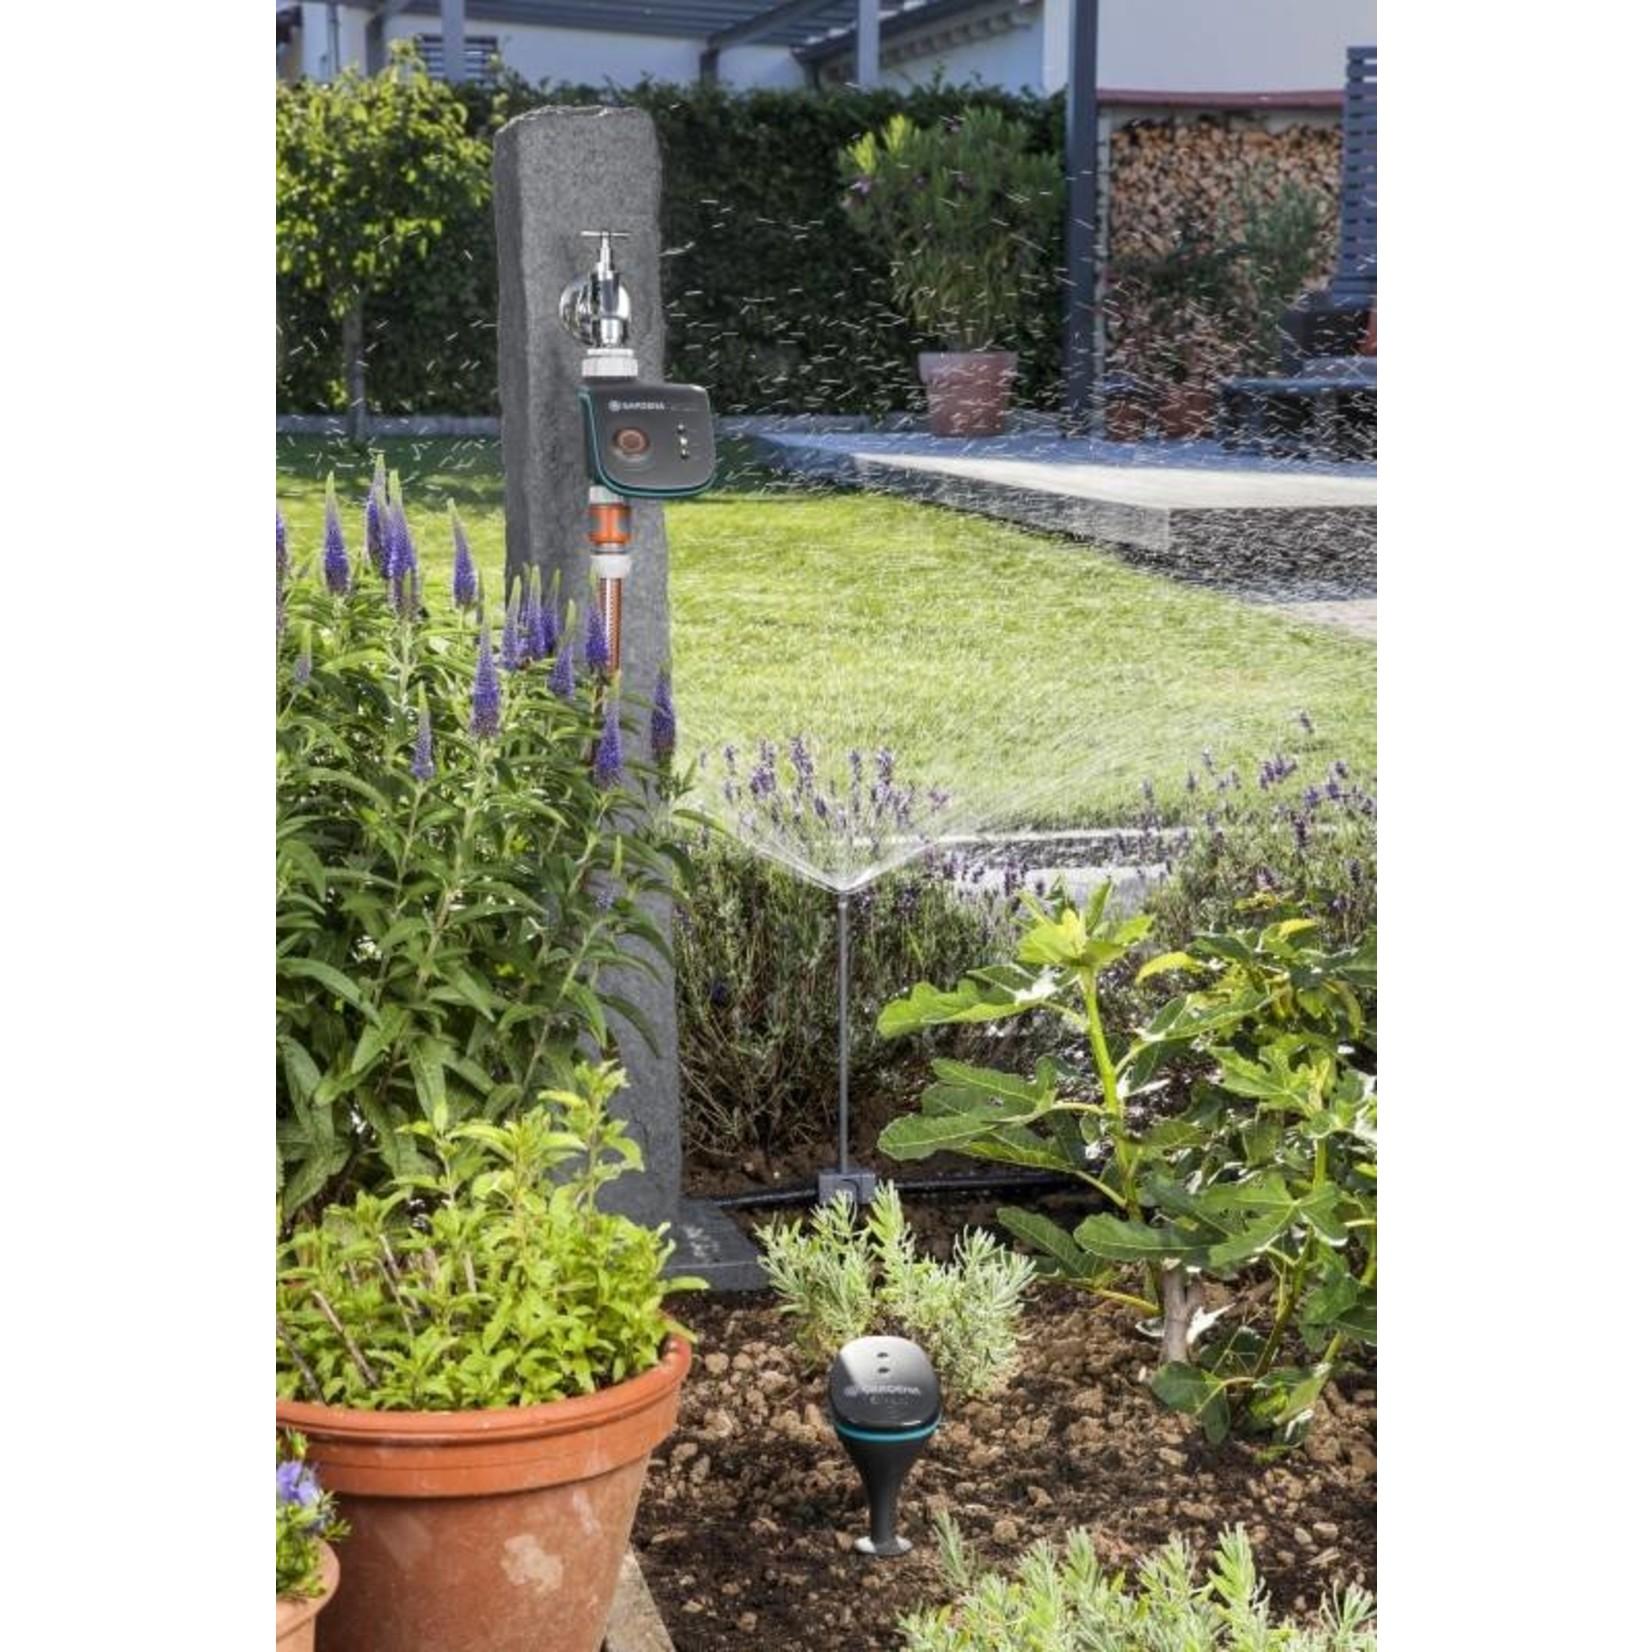 Gardena Gardena Smart Water Control